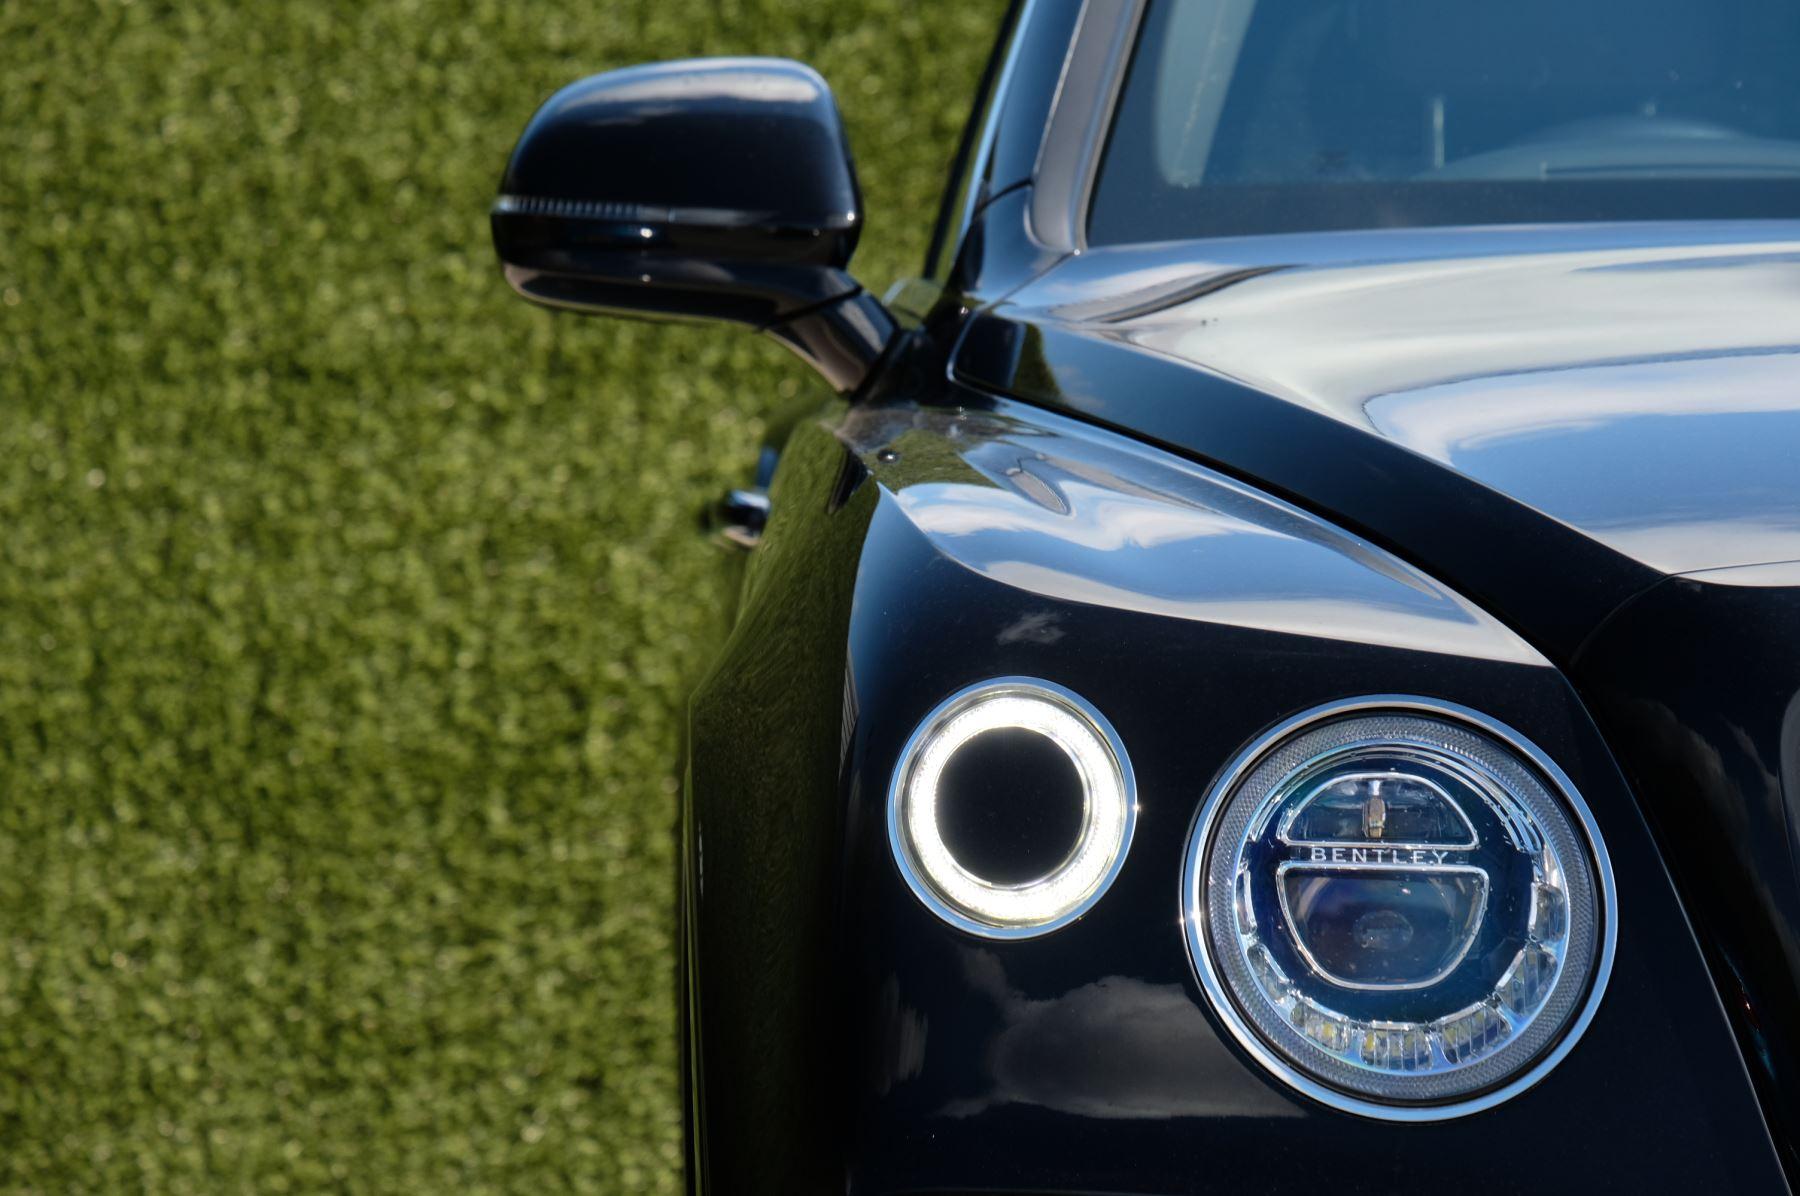 Bentley Bentayga 4.0 V8 5dr image 6